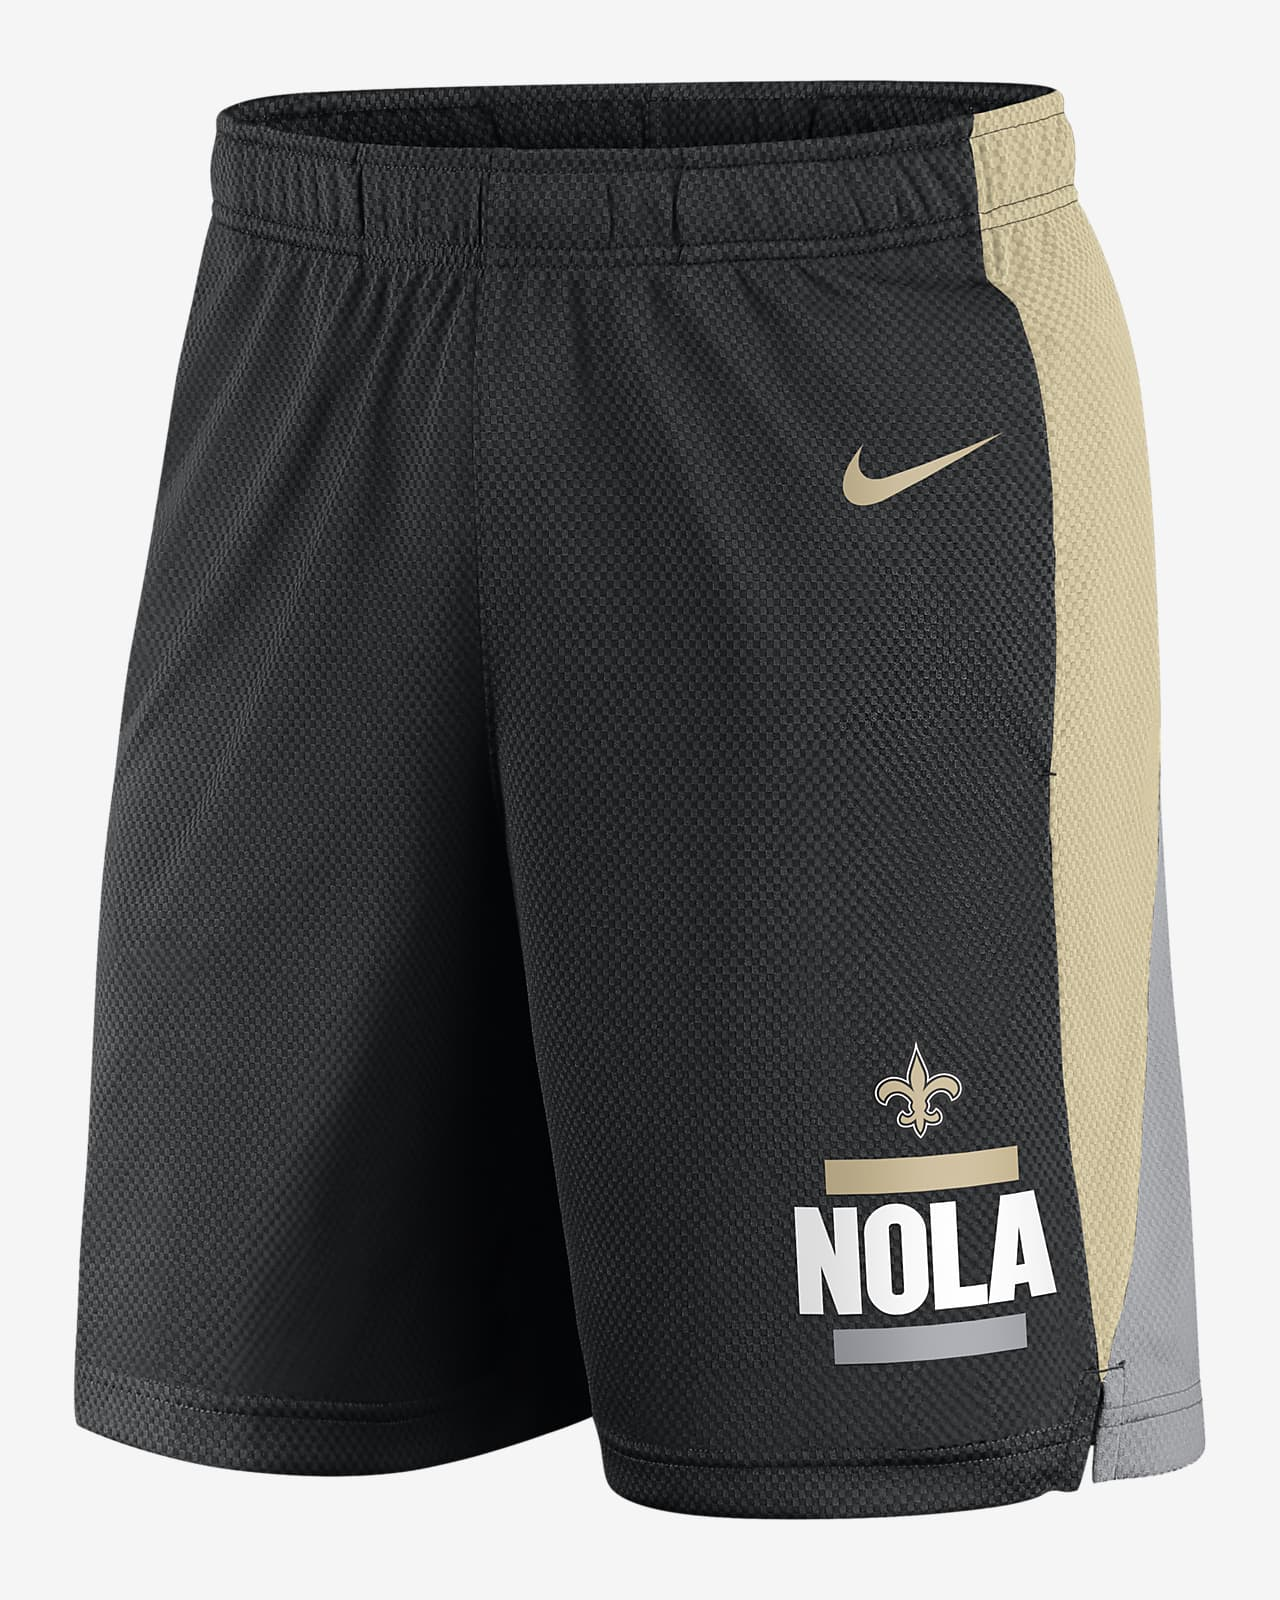 Nike Dri-FIT Broadcast (NFL New Orleans Saints) Men's Shorts